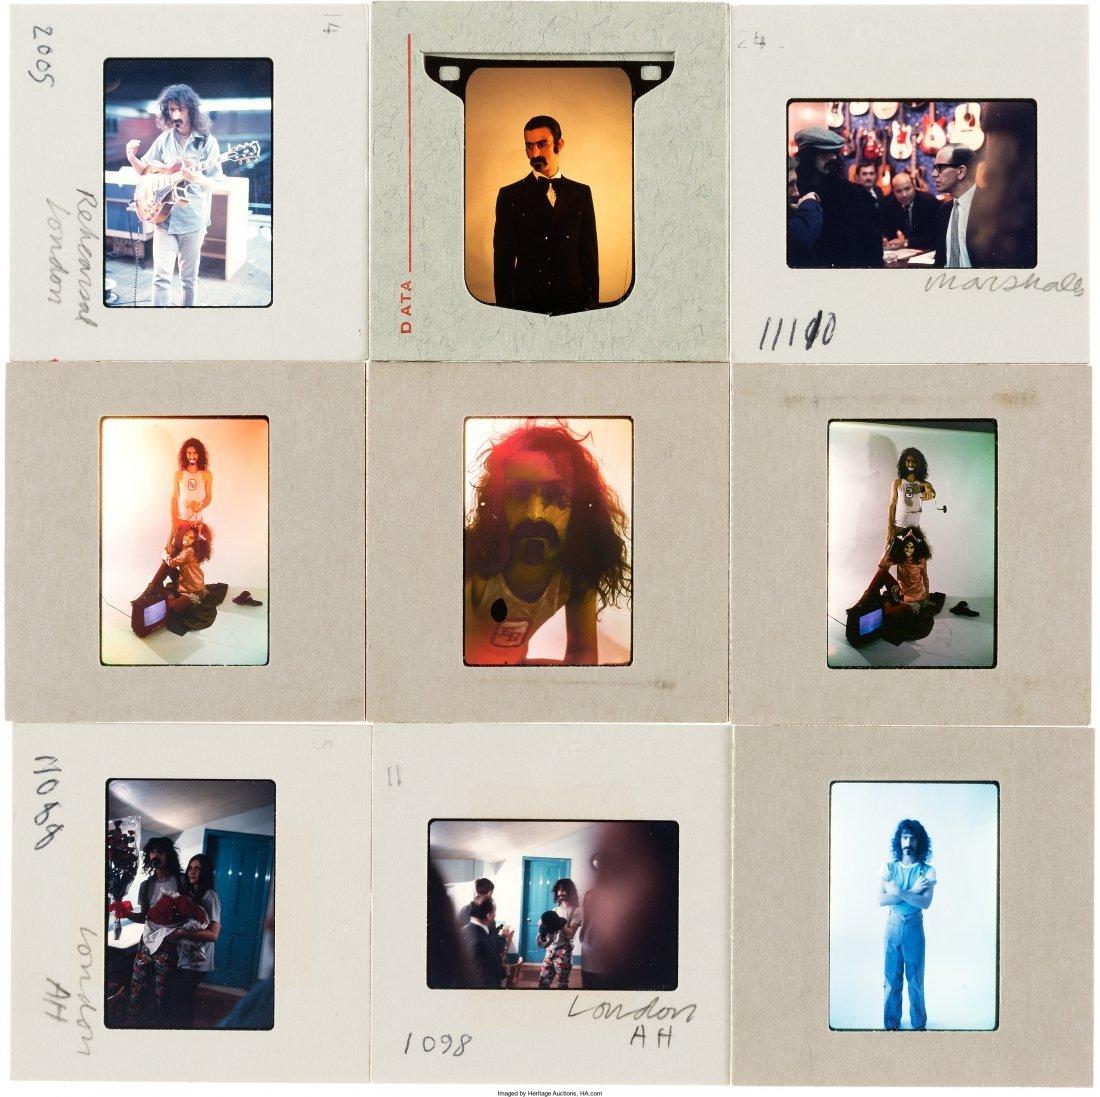 89578: Frank Zappa - Set of Fifty Color Photo Slides (L - 4